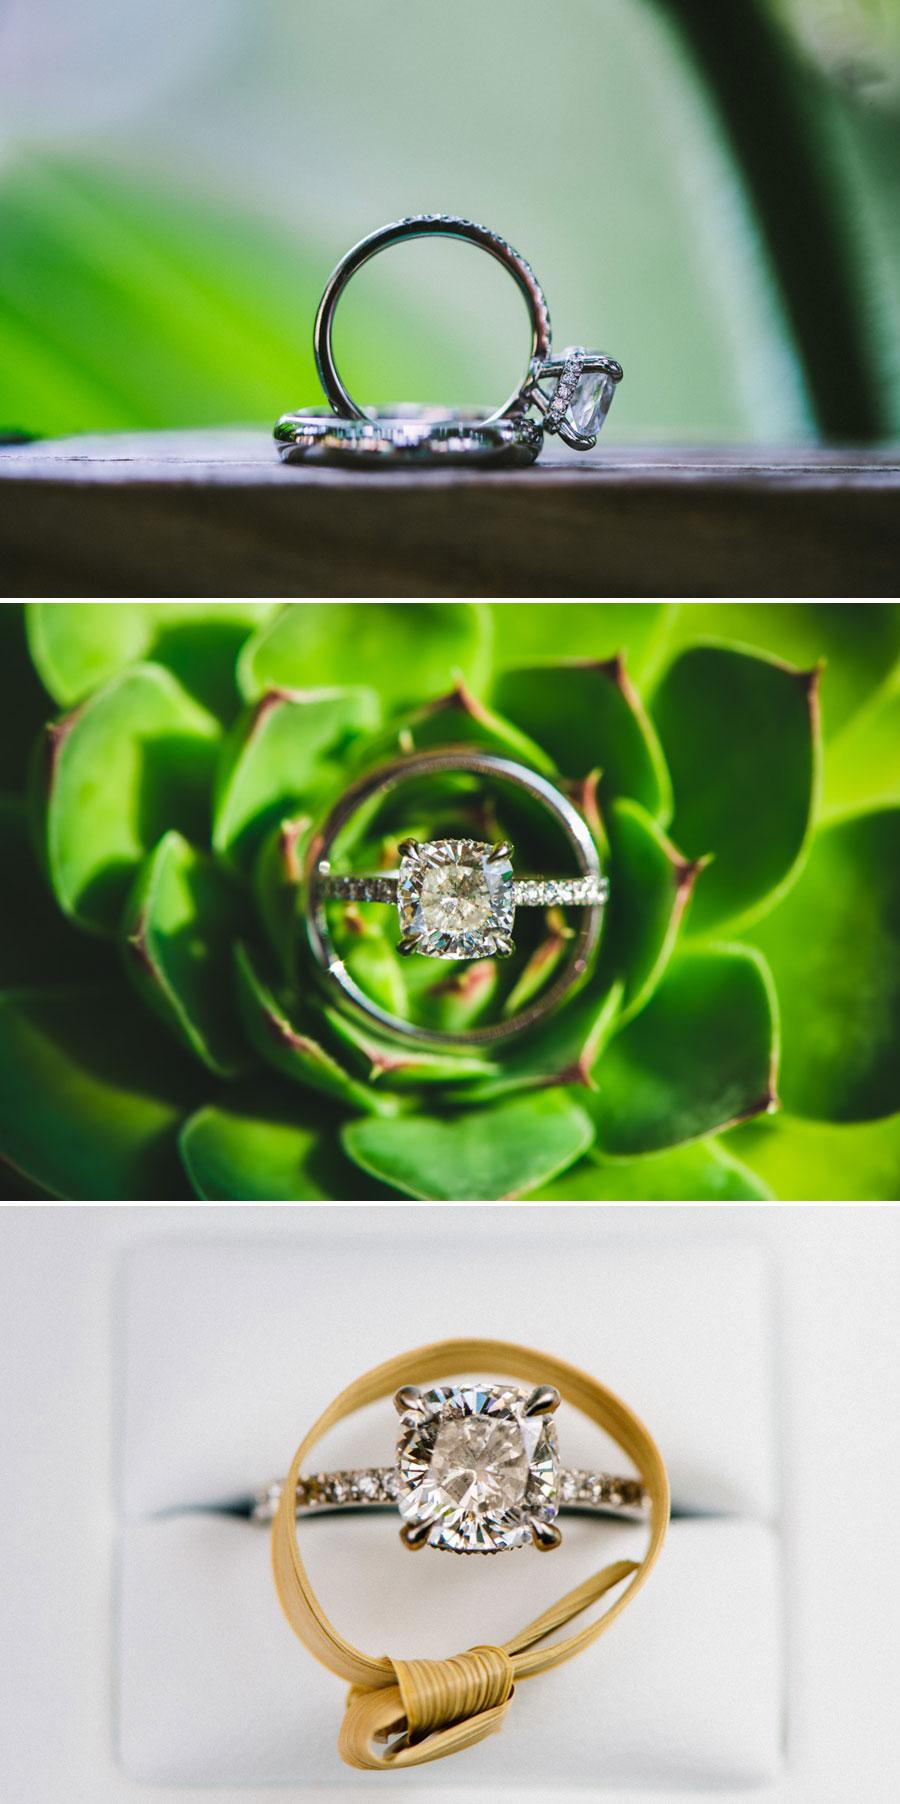 pittsburgh-wedding-photographer-at-university-club-vietnamese-tea-ceremony-wedding-oakland-02